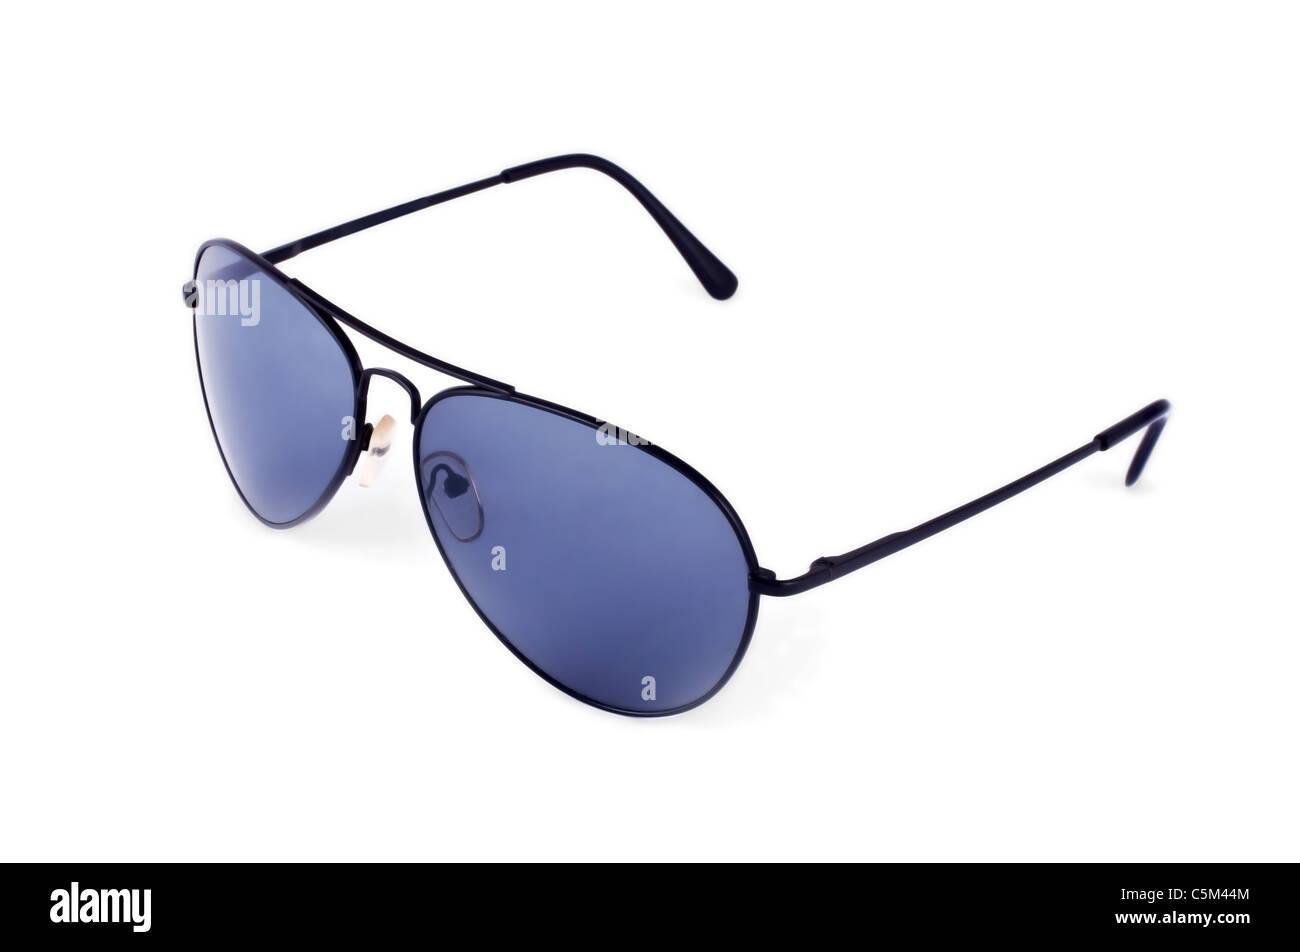 Aviator sunglasses isolated on white background Stock Photo